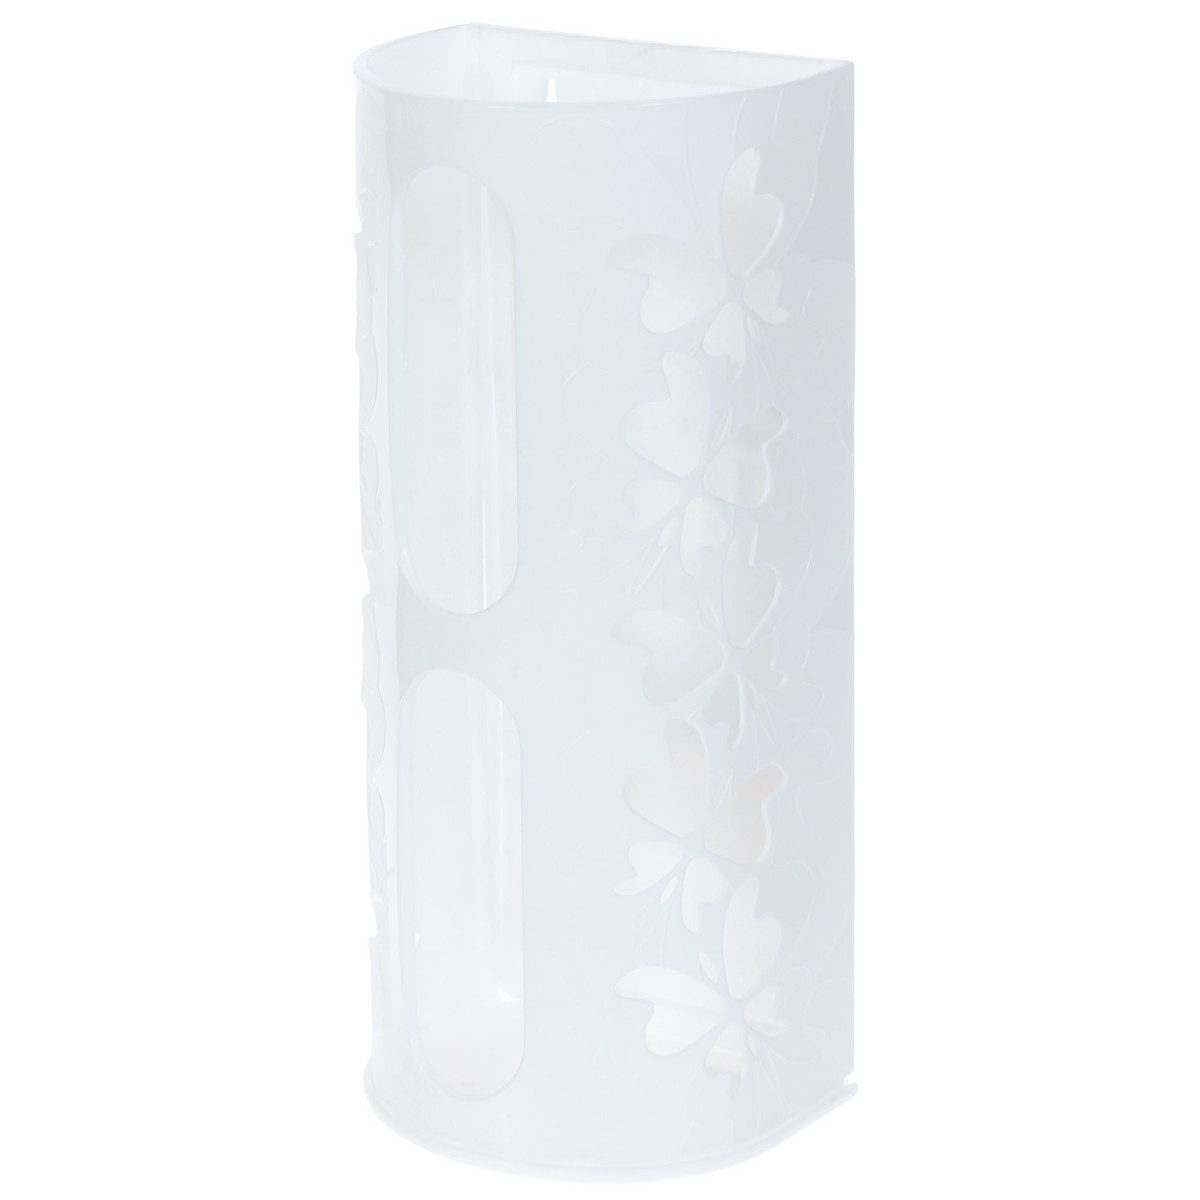 Корзина для пакетов Fly цвет белый